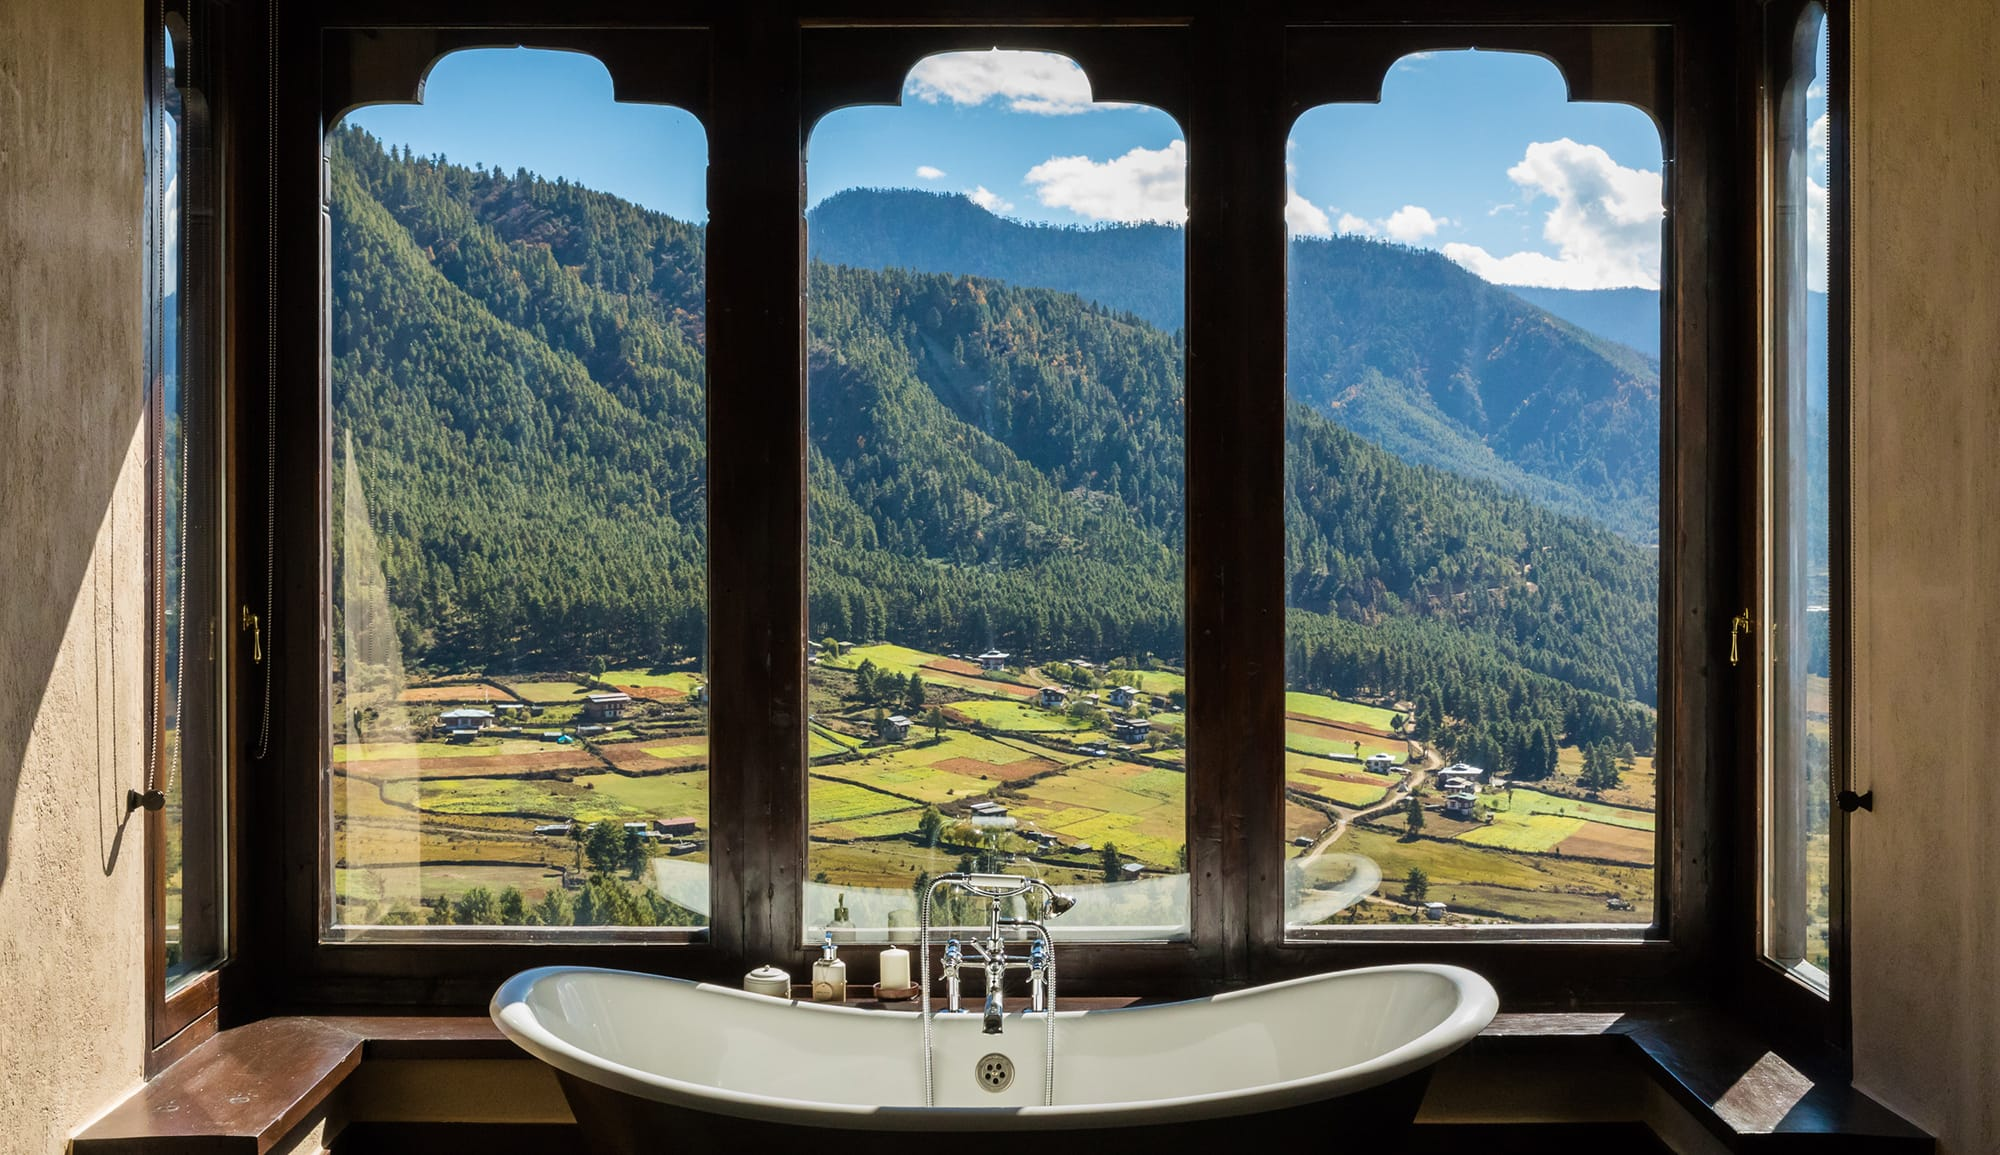 「Gangtey Lodge  ガンティーロッジ」(ブータン・ガンテ) 渓谷の上にあり、雄大な自然や牧歌的な生活を眺望できる。